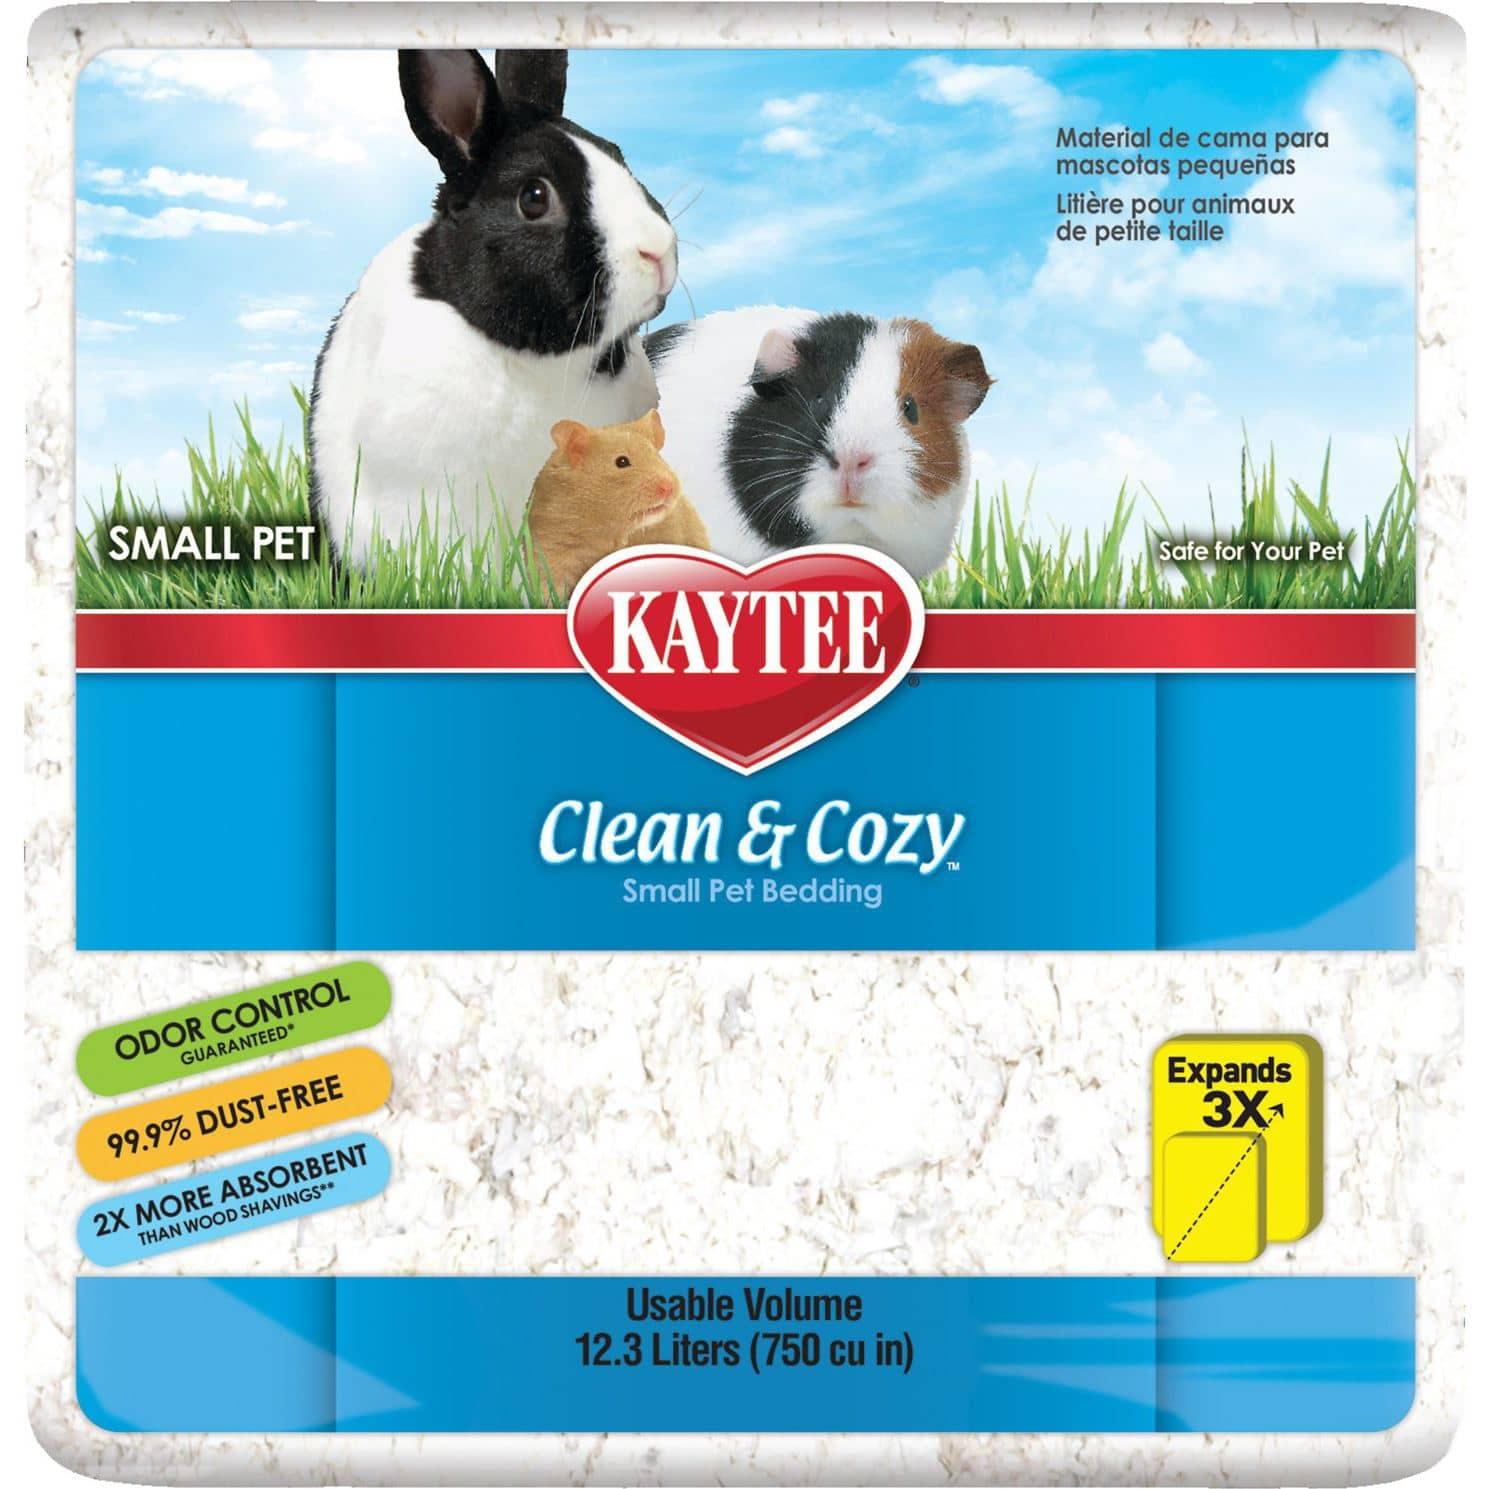 Kaytee 100037607 Clean & Cozy Bedding